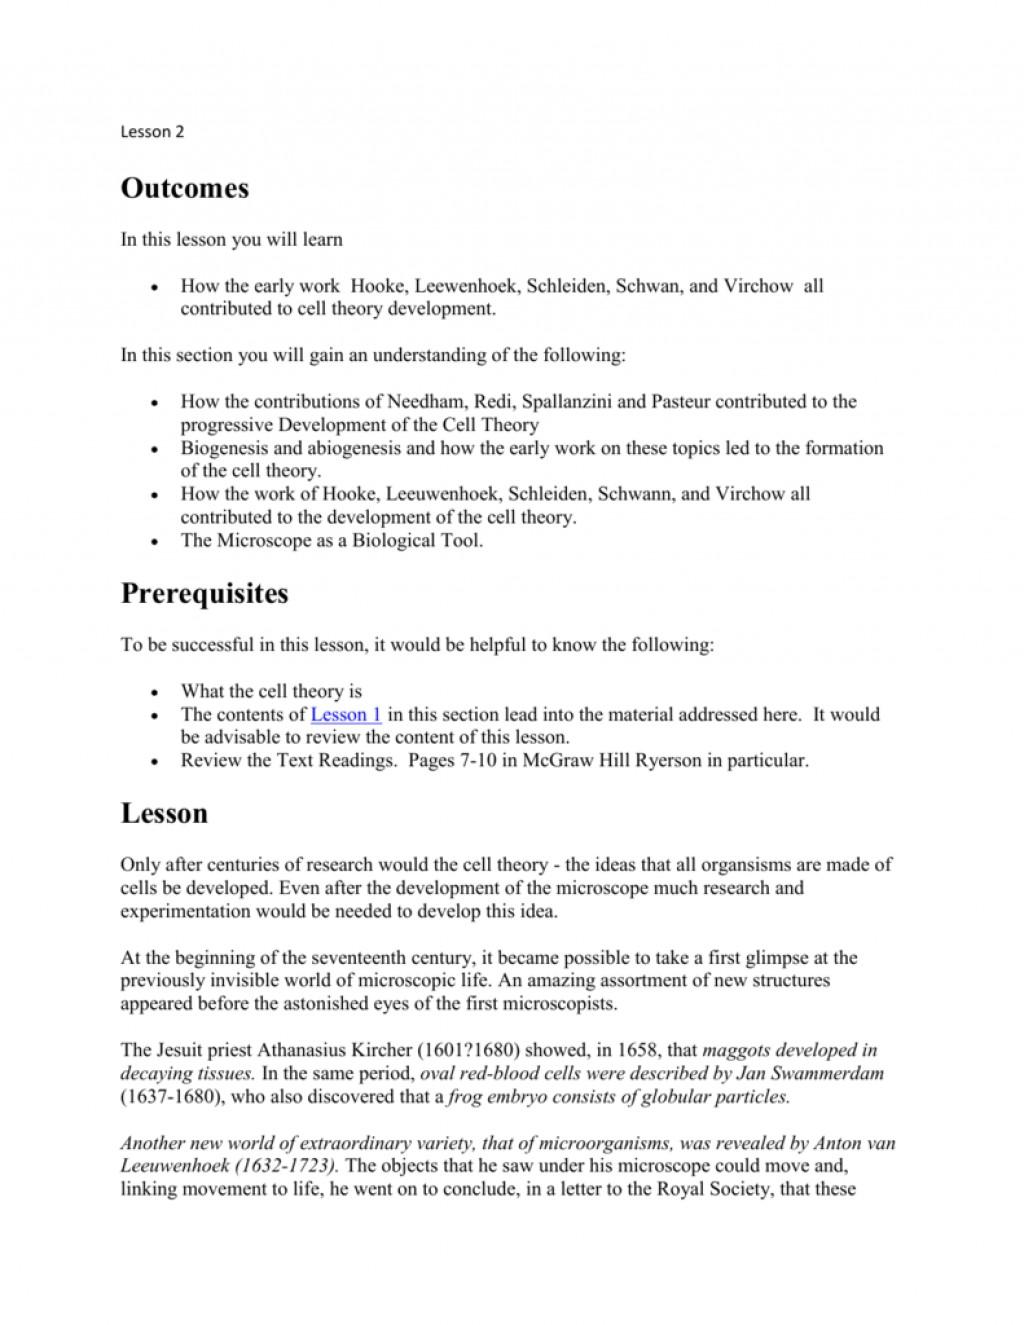 013 009009493 1 Essay Example Argumentative Unique Pdf Rubric High School Writing Sample Large